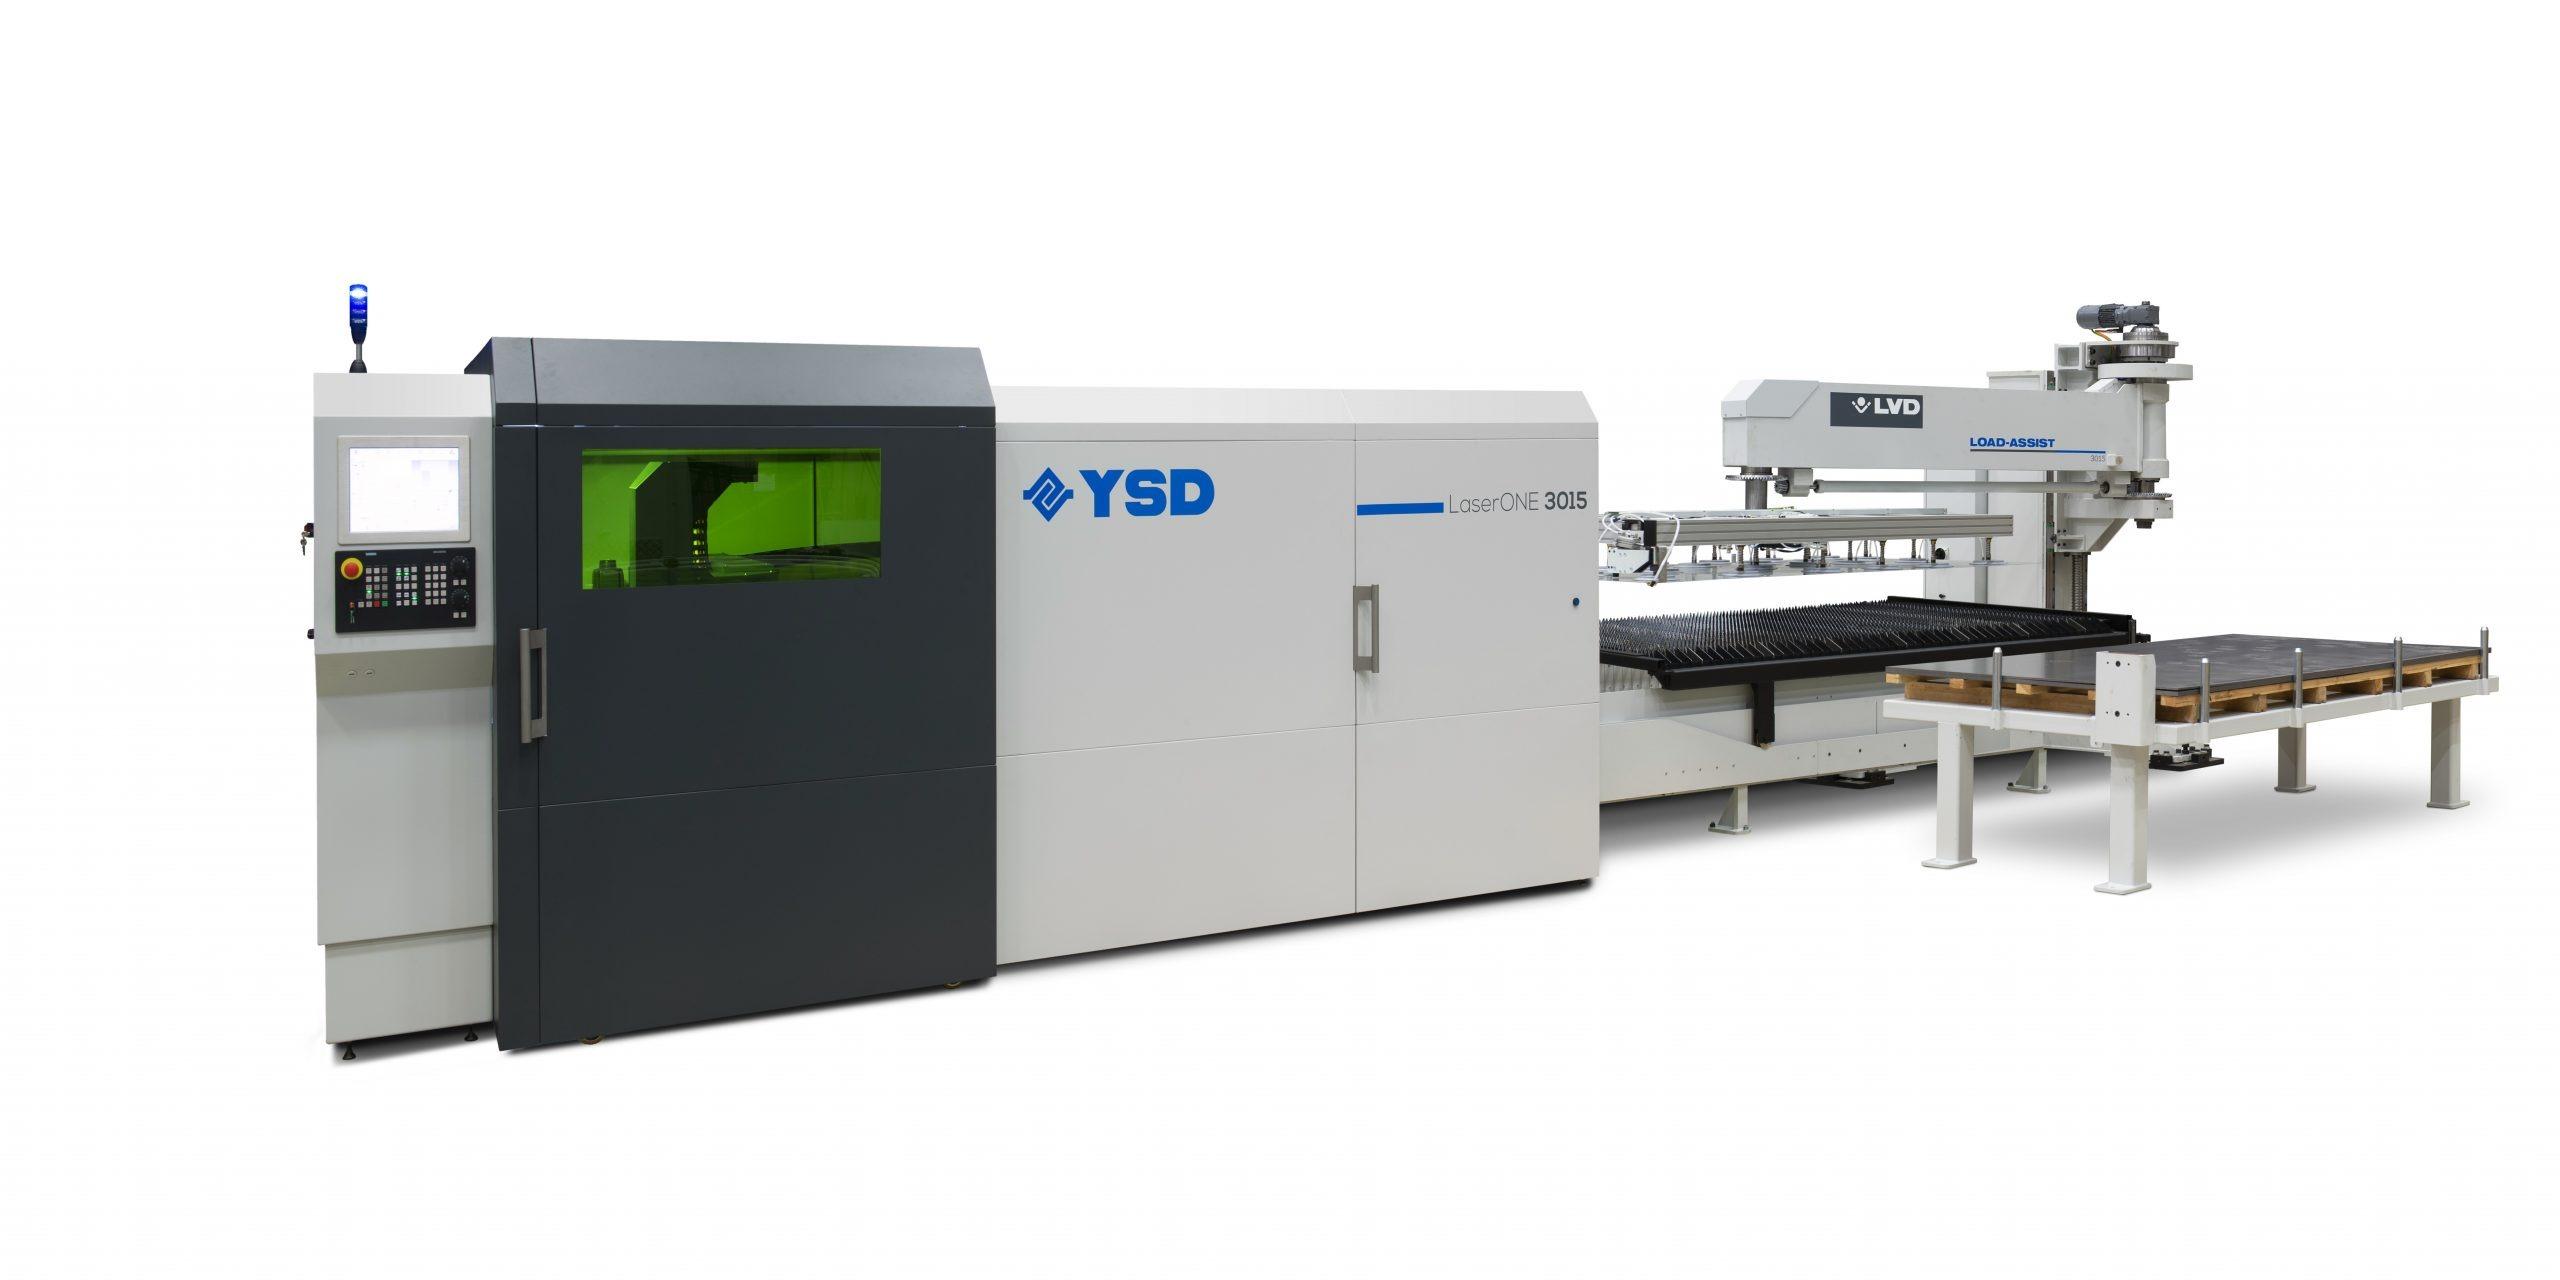 Lakštų pjovimo lazeris LVD YSD Laser One